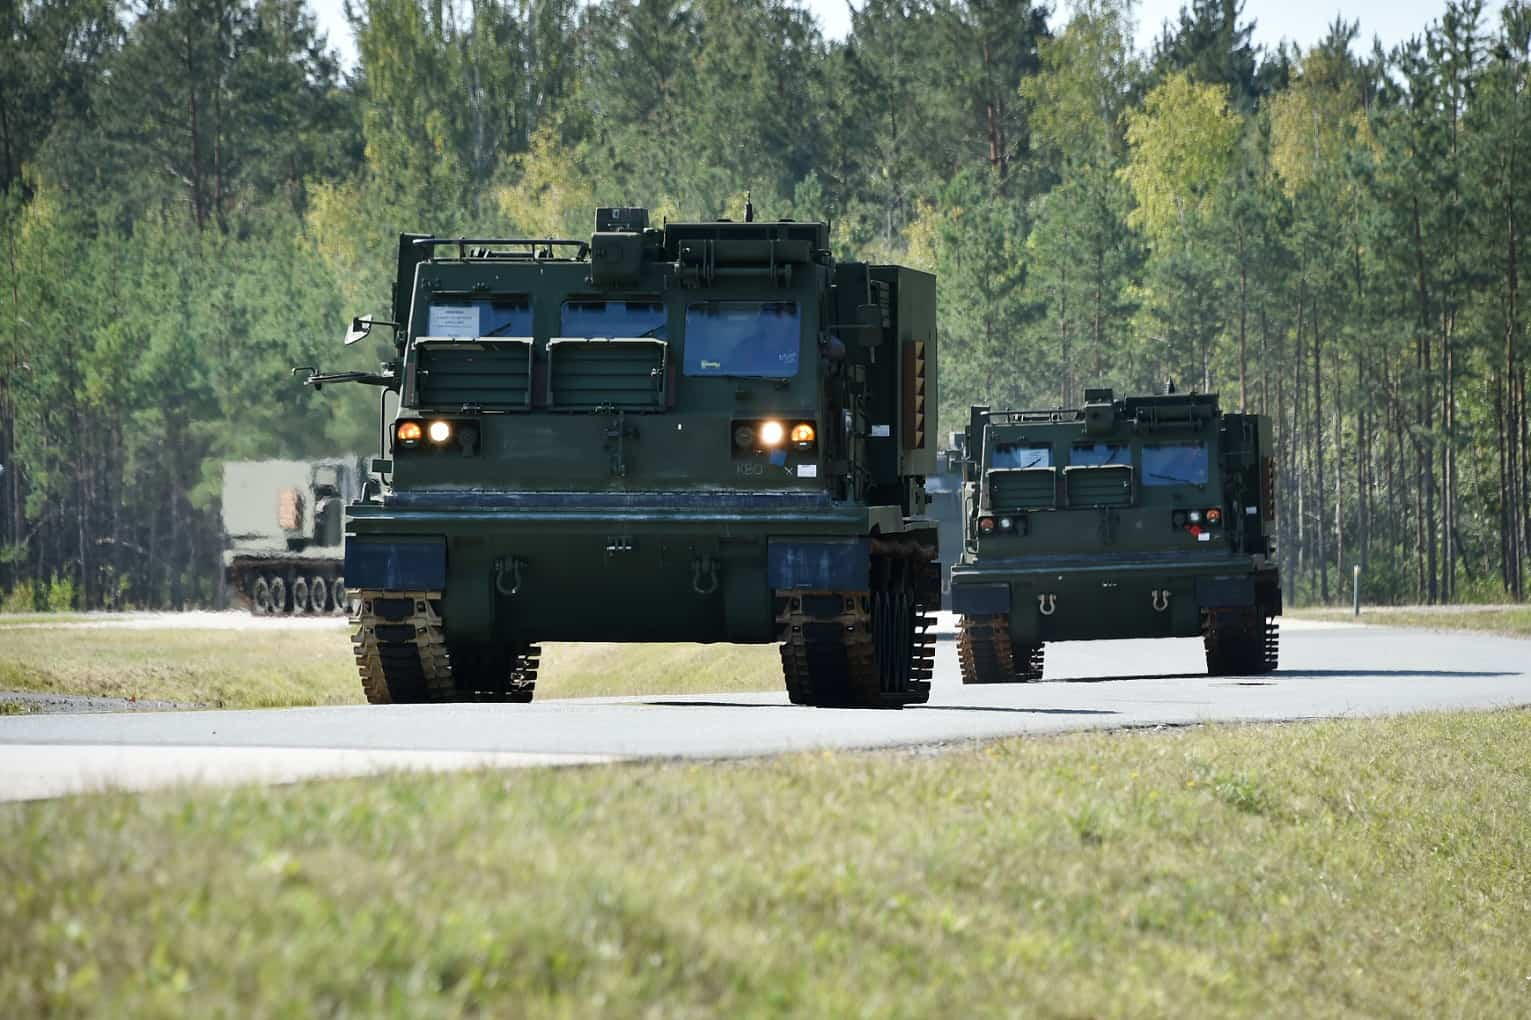 M270: Οι ΗΠΑ εξοπλίζουν με πυραυλικά συστήματα την Ευρώπη [pic]